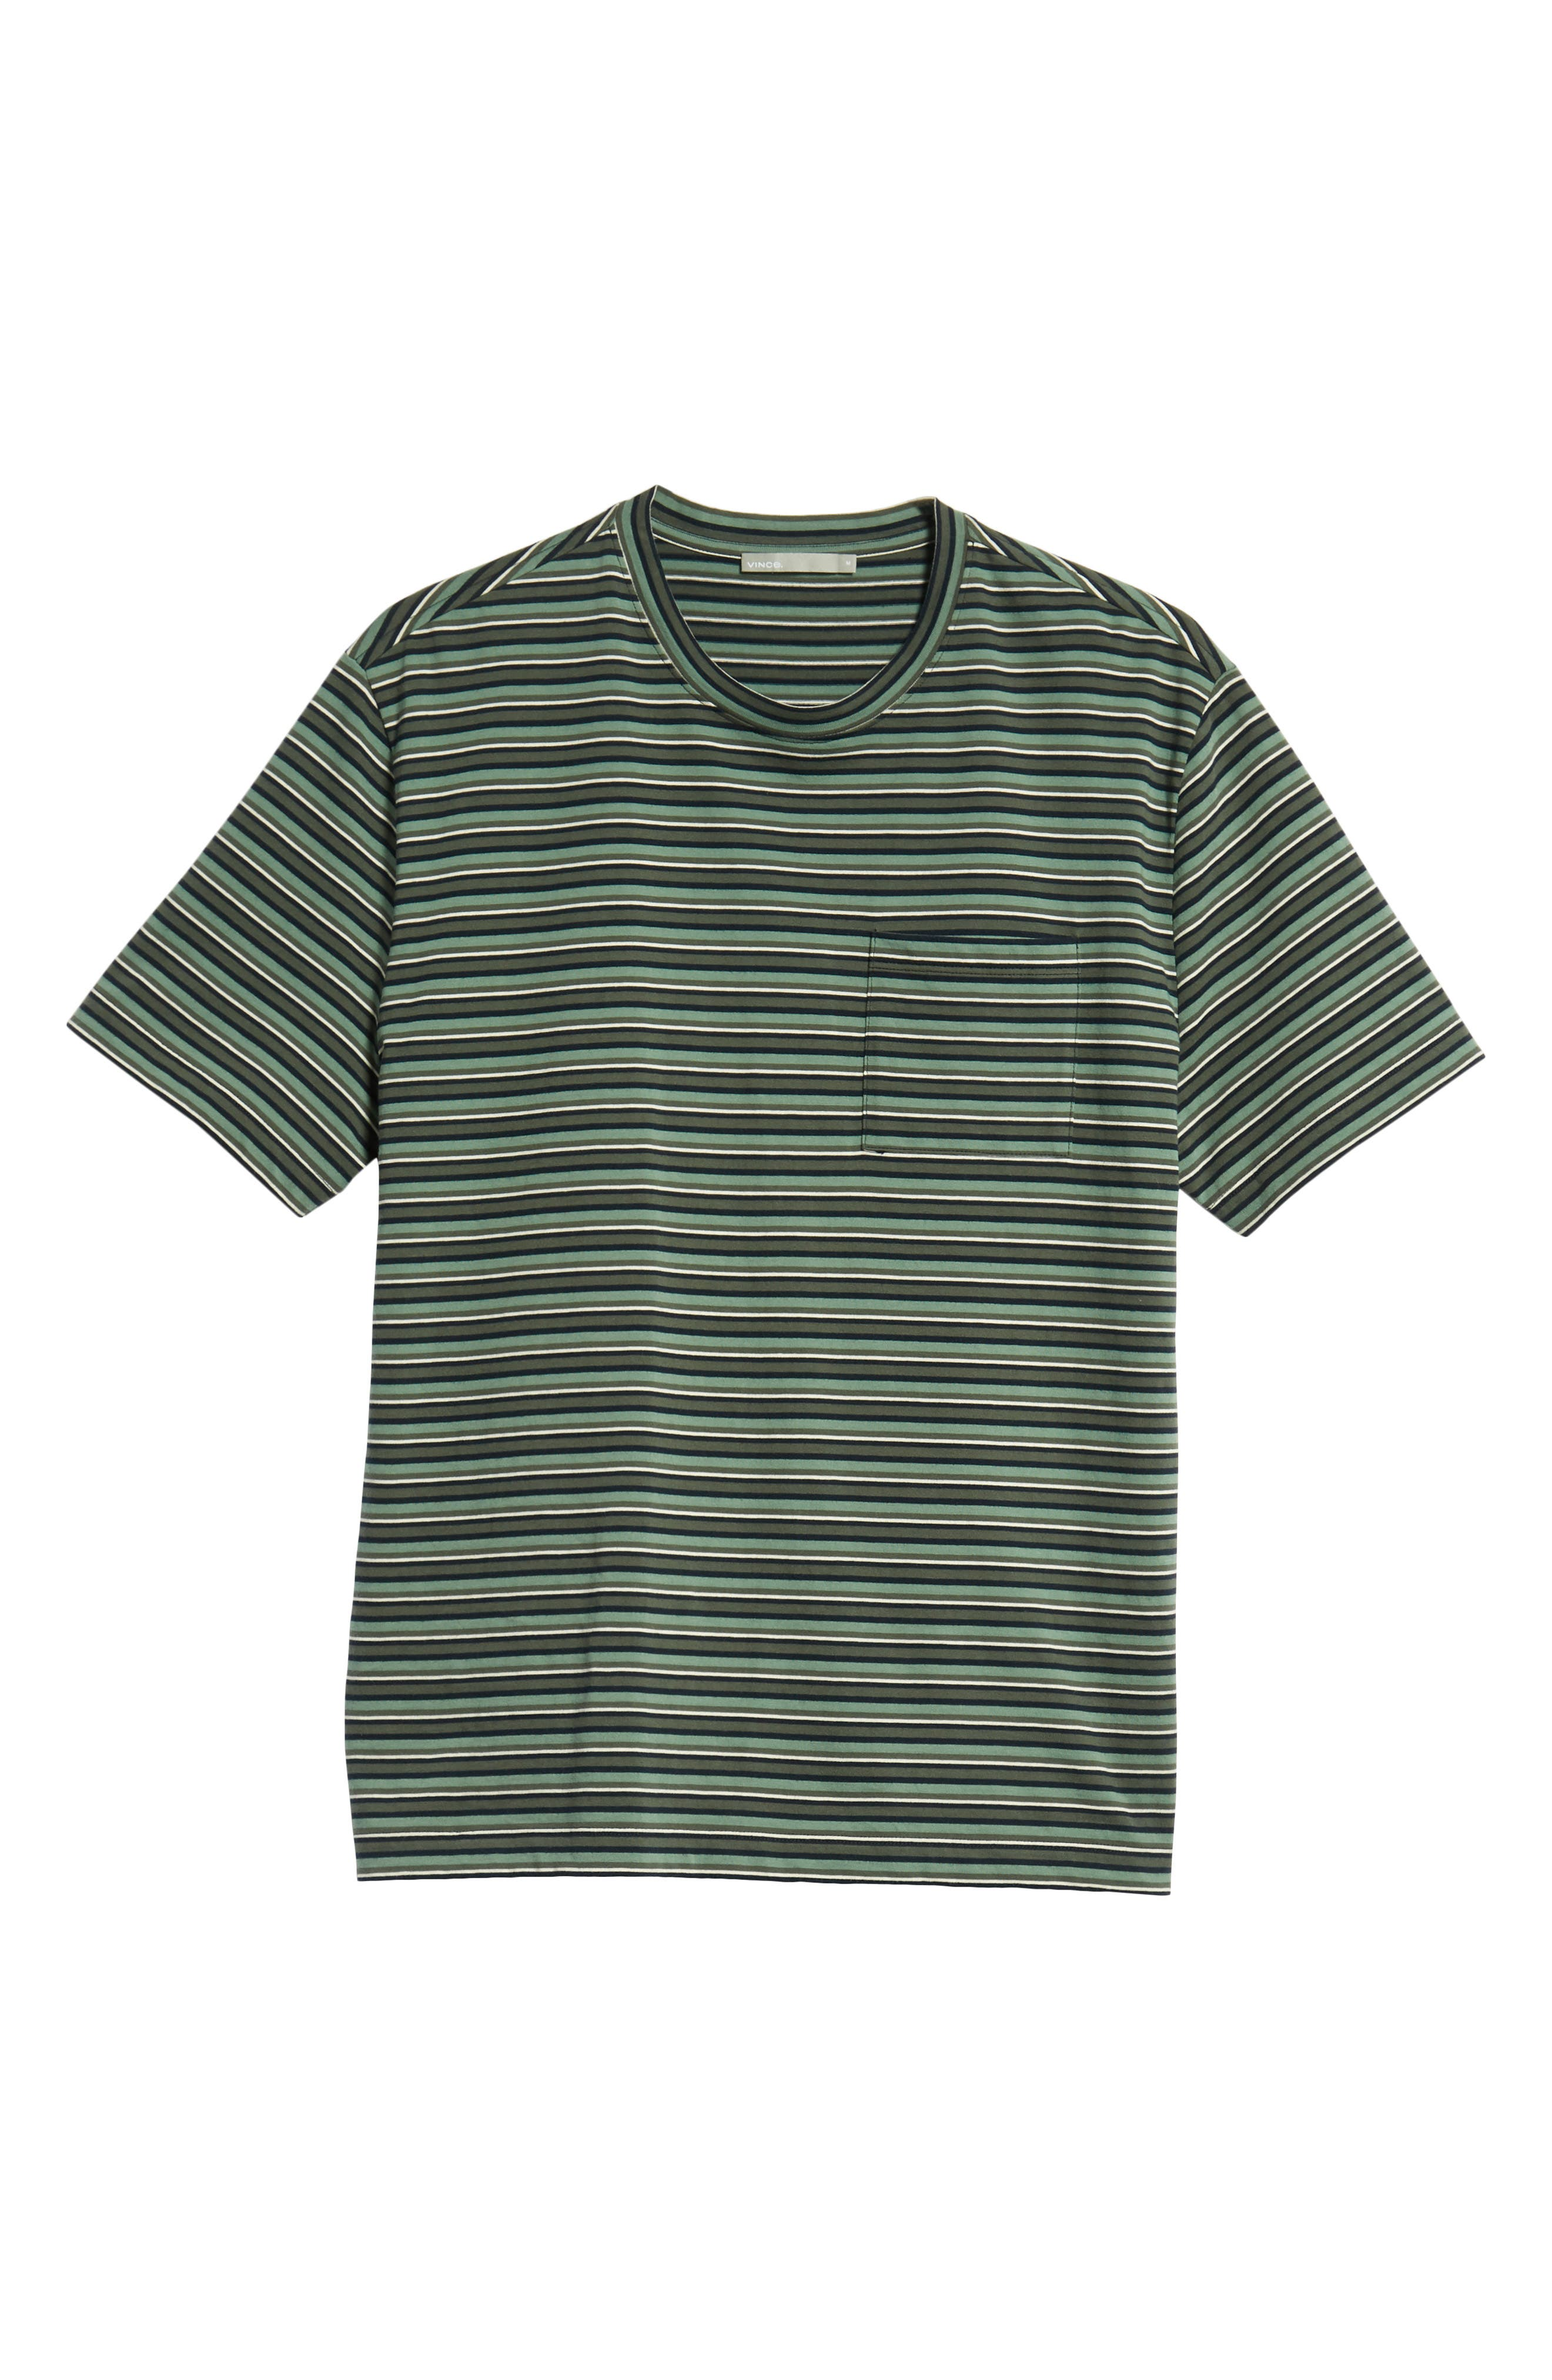 Regular Fit Multistripe Pocket T-Shirt,                             Alternate thumbnail 6, color,                             341